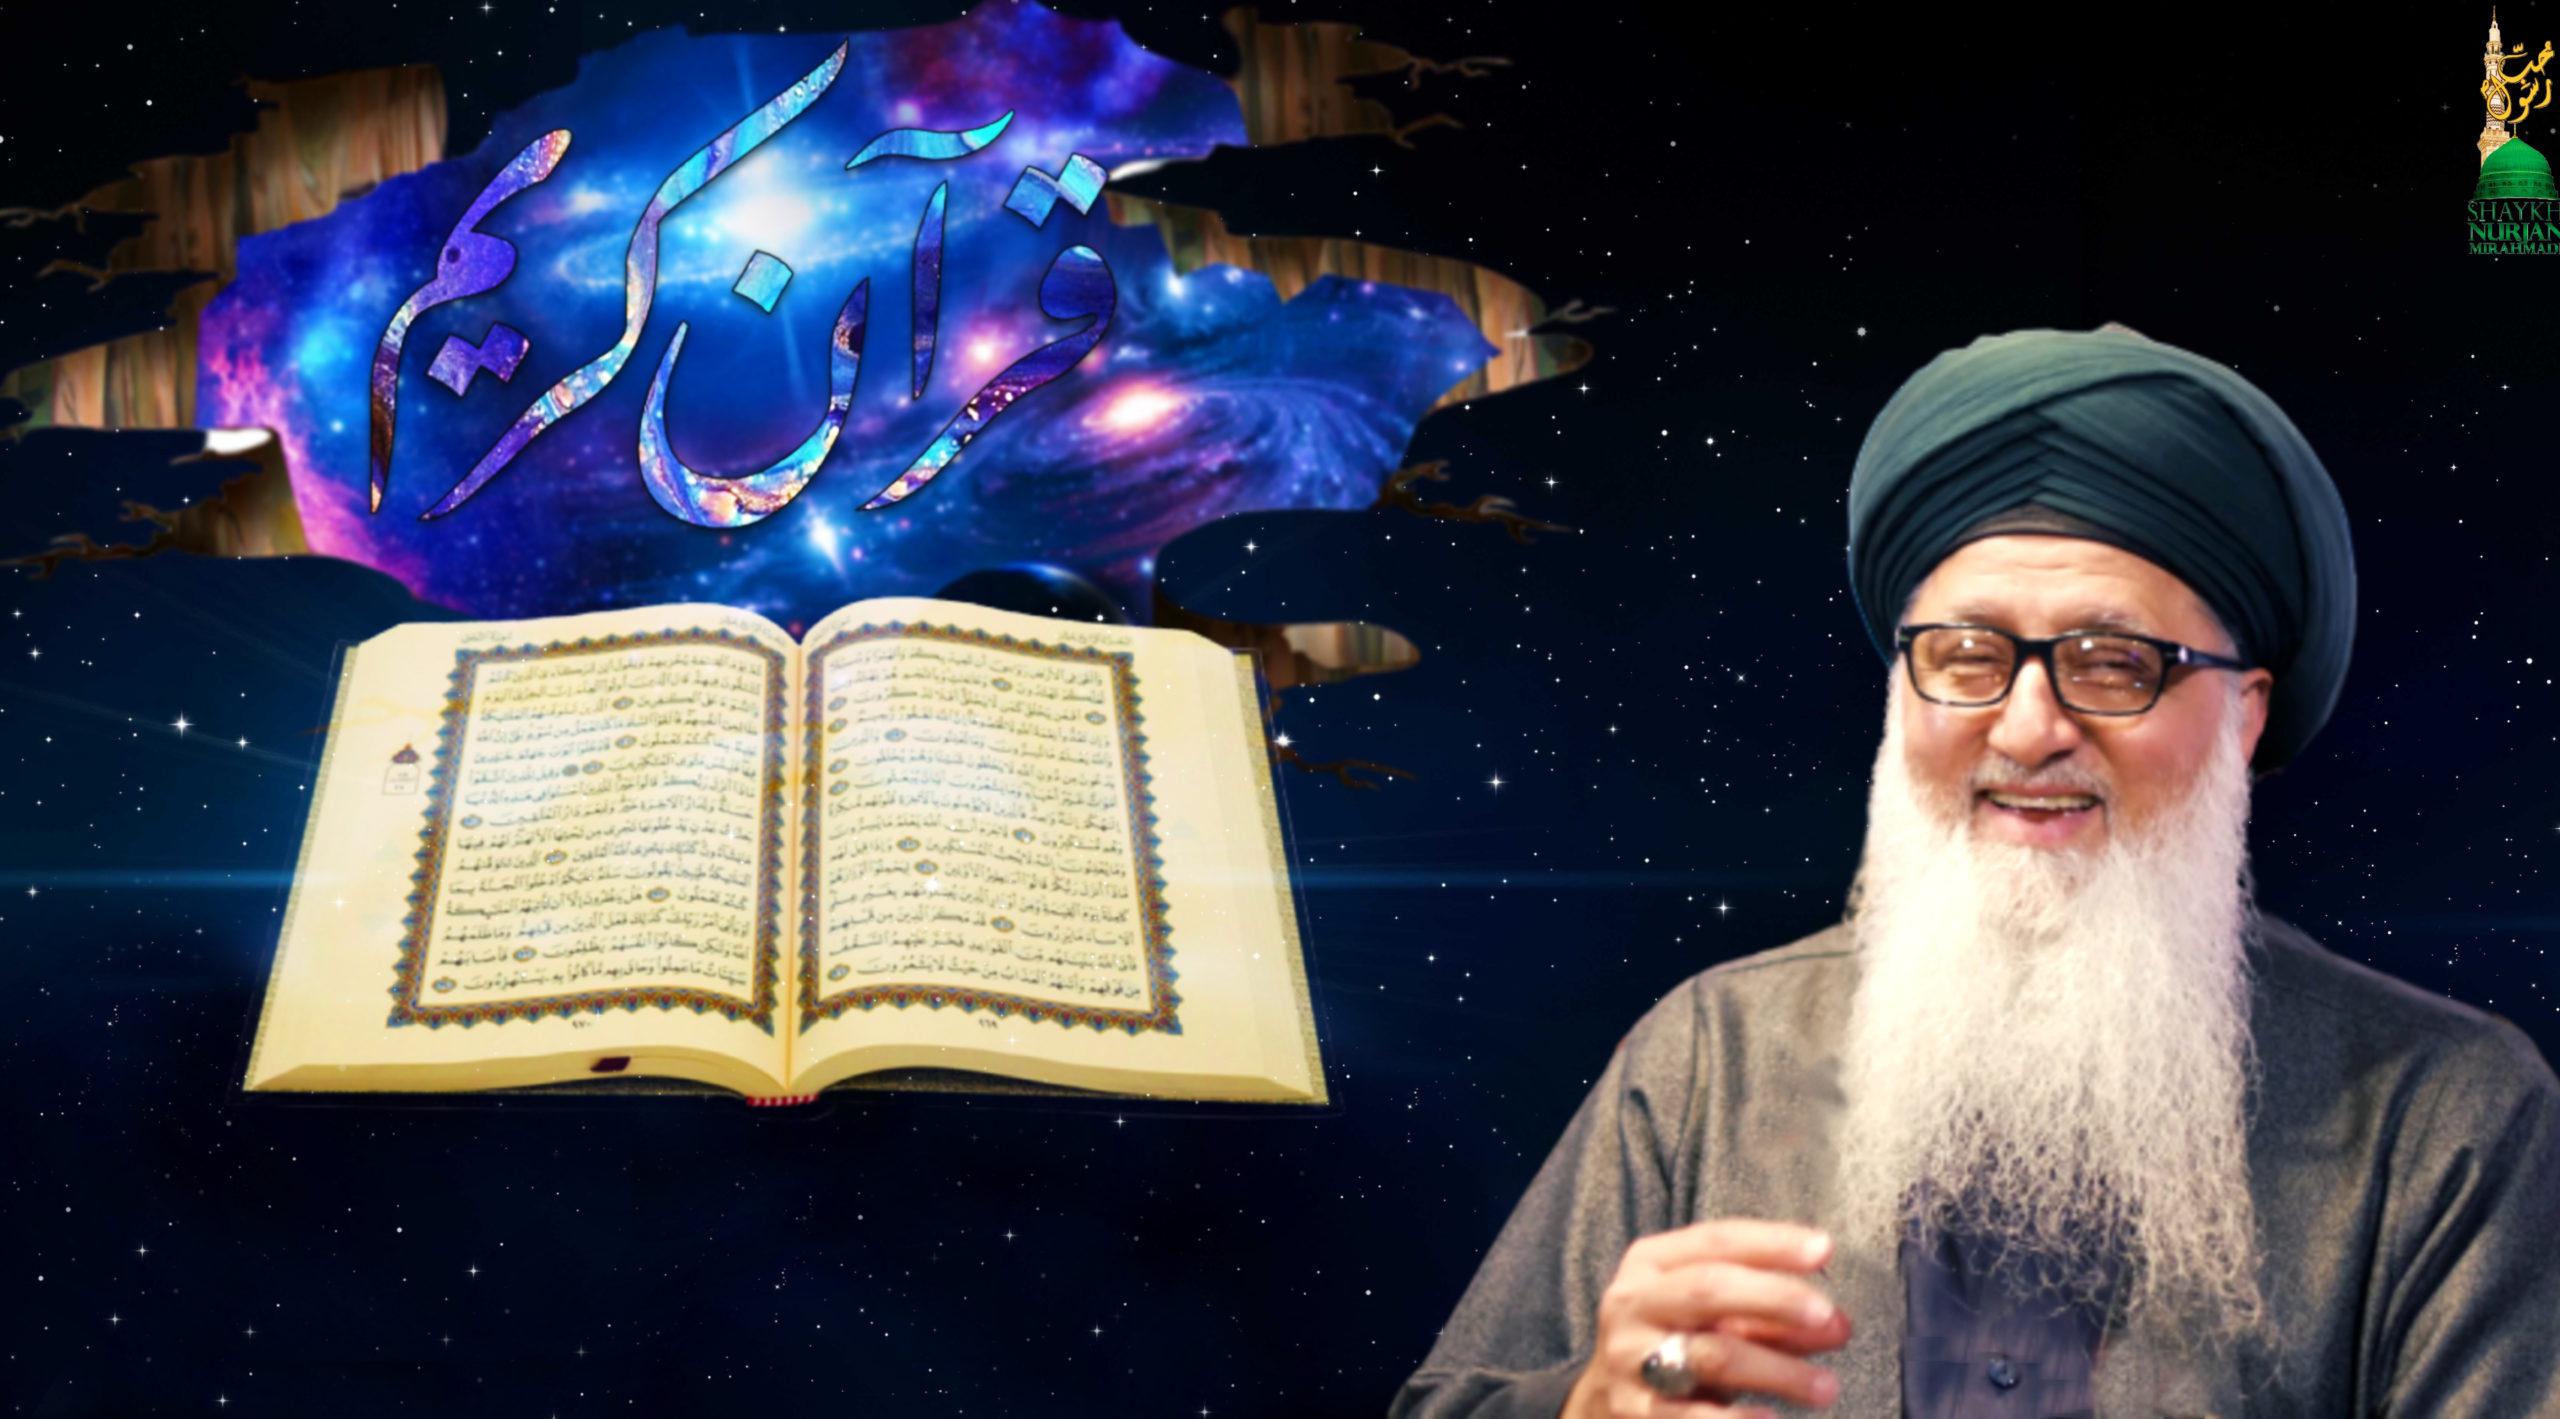 Shaykh Nurjan Mirahmadi Holy Quran, Quran Kareem Calligraphy, logo